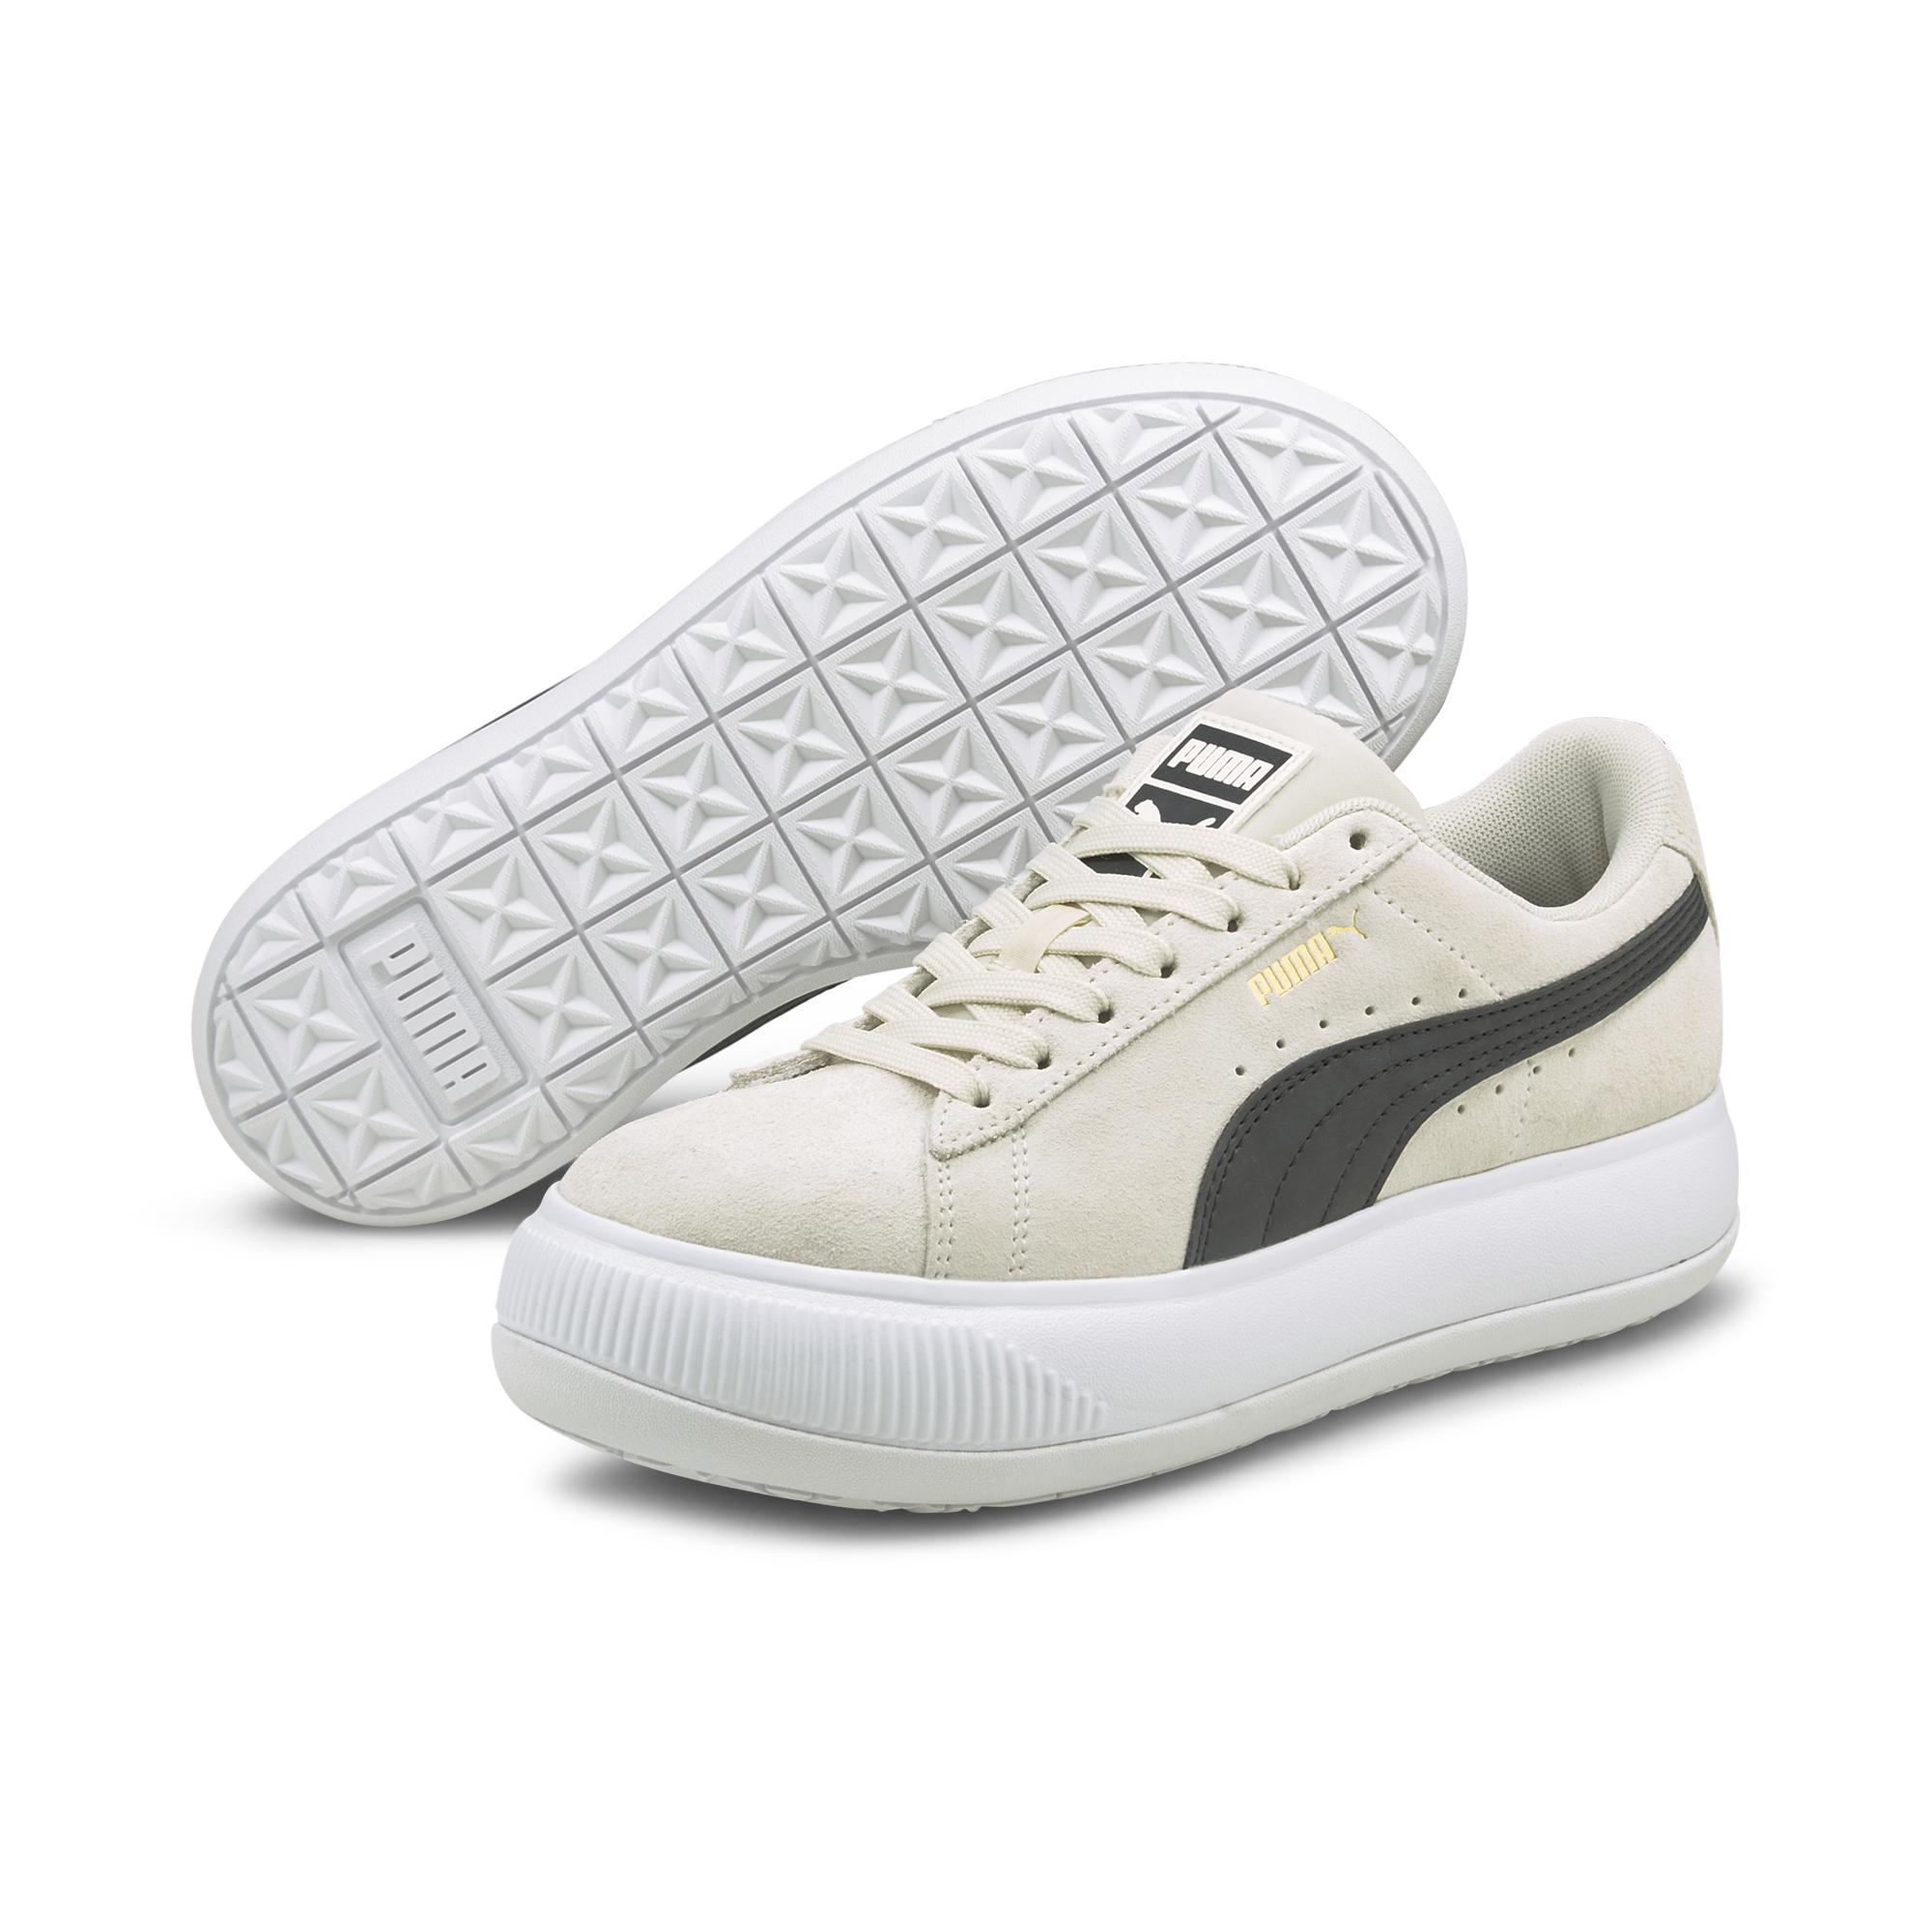 Puma Suede Mayu UP sneakers